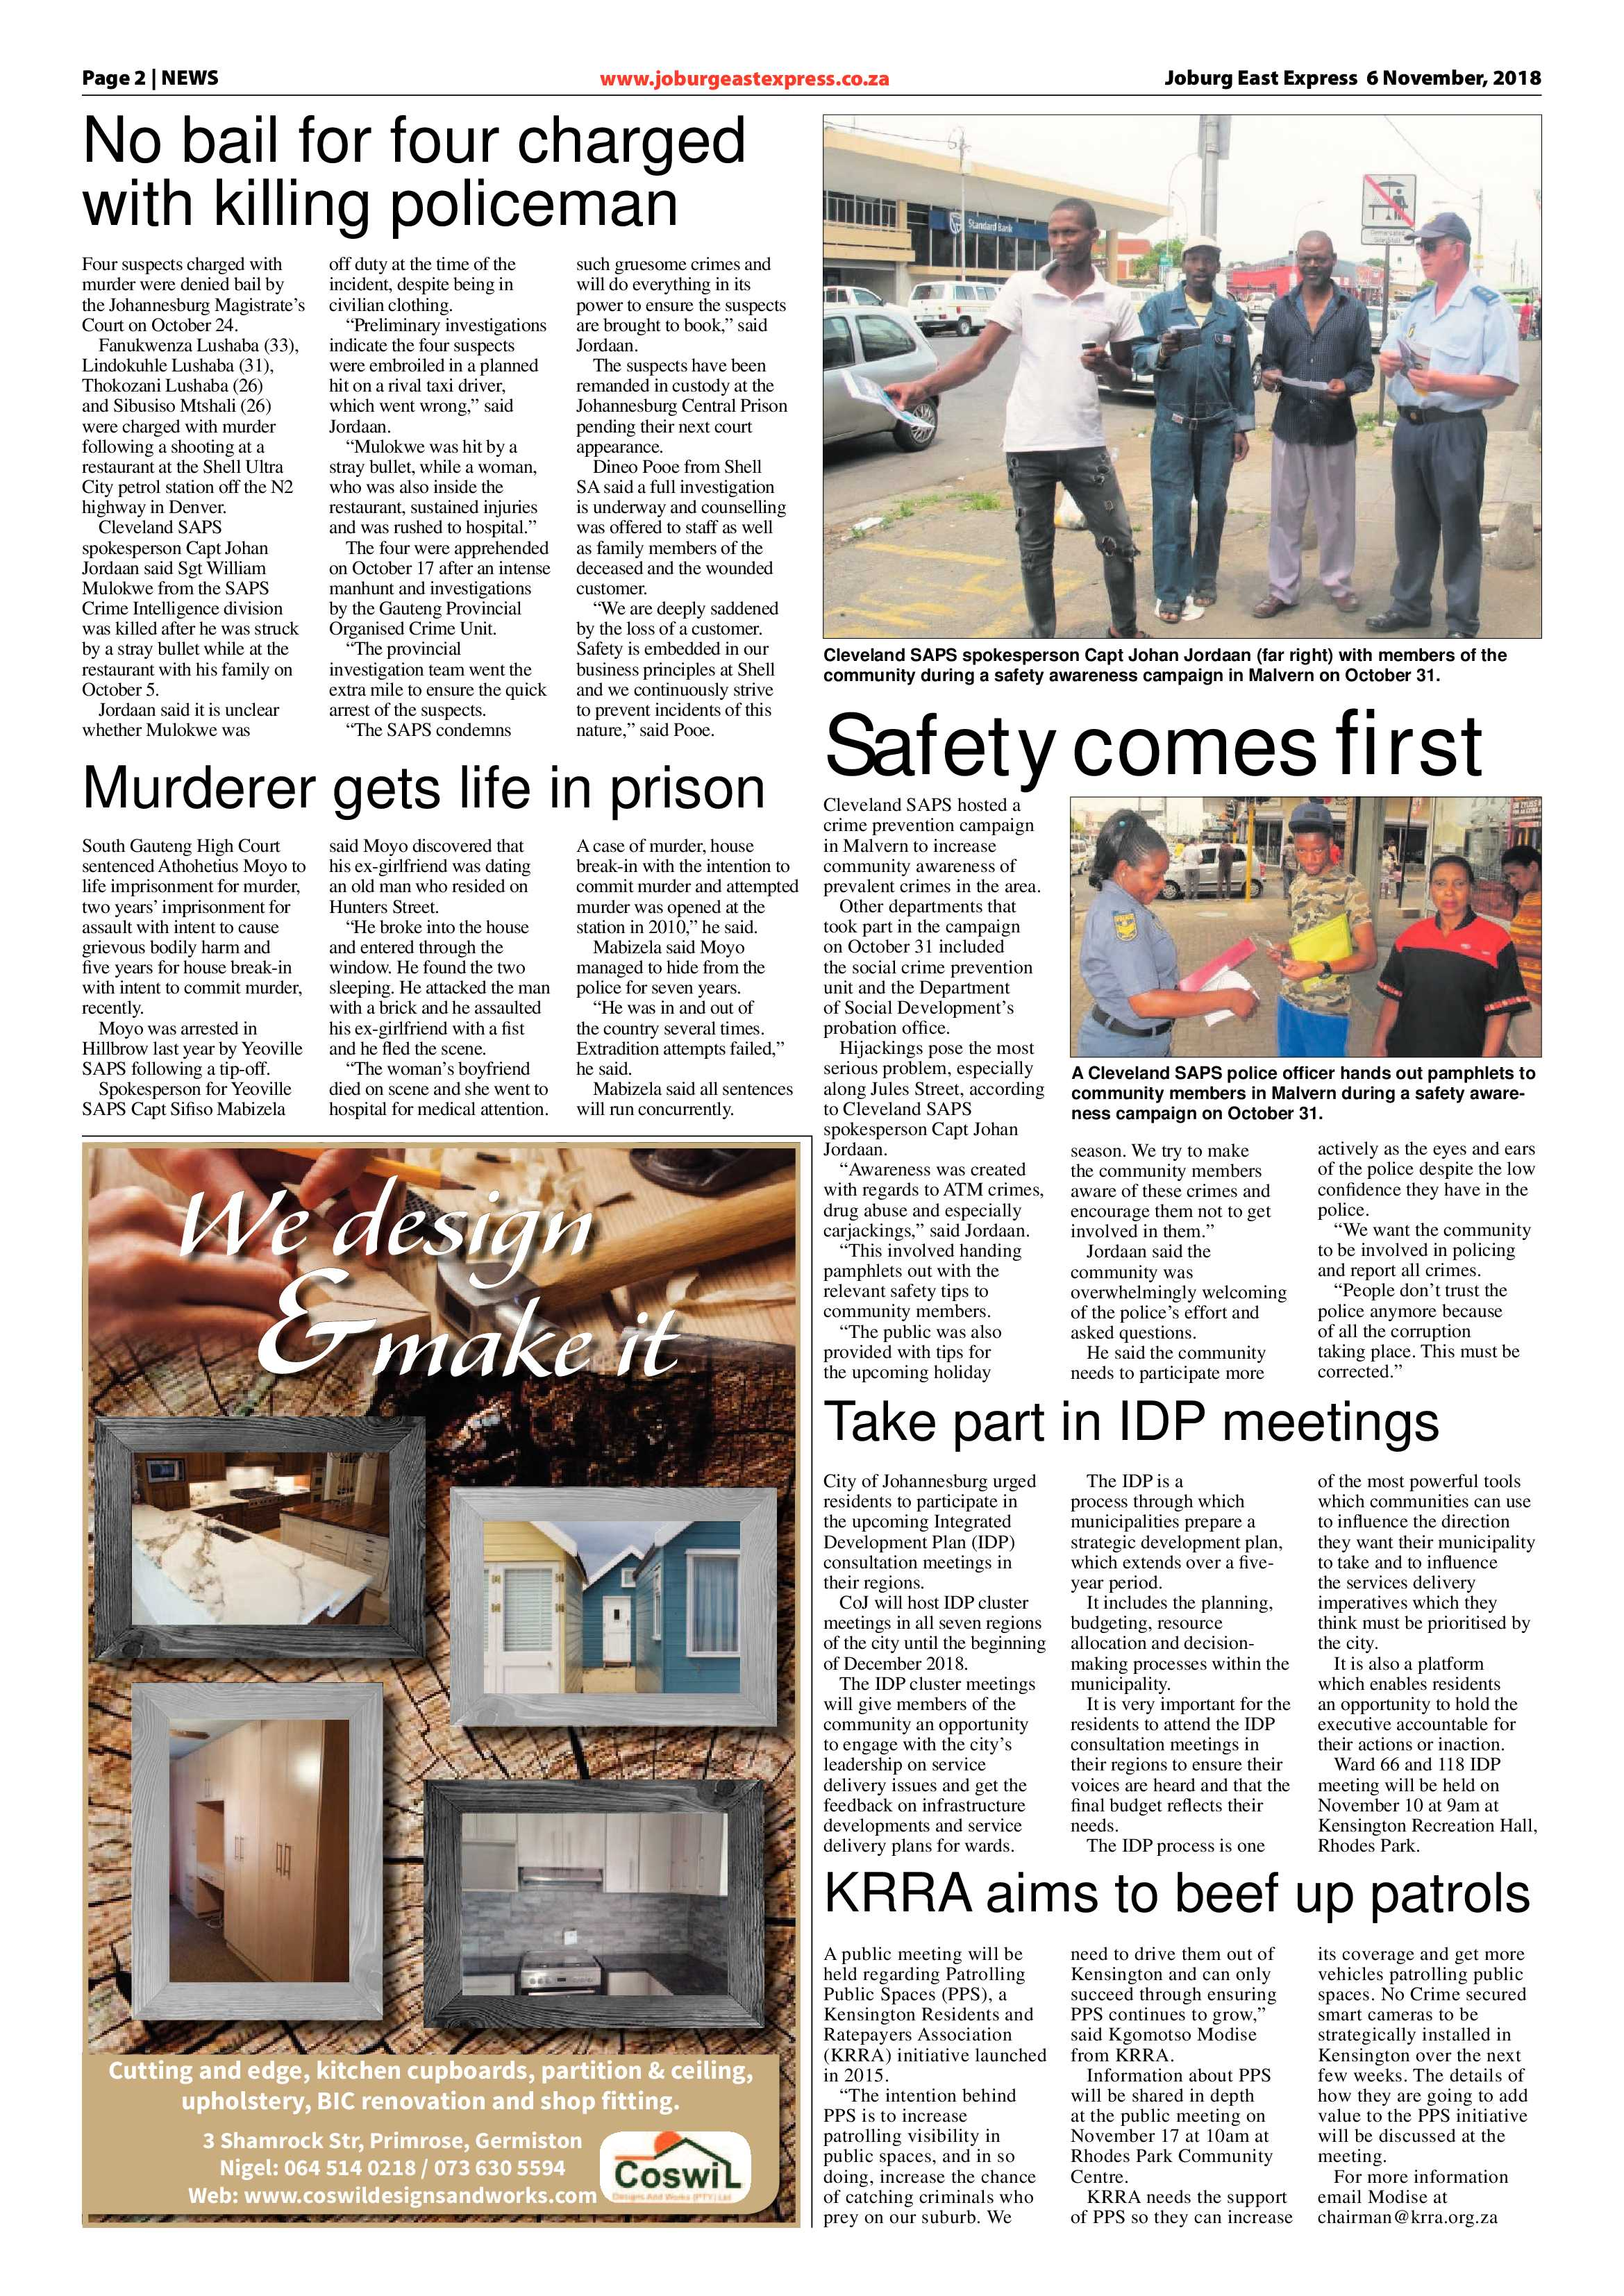 joburg-east-express-06-november-2018-epapers-page-2